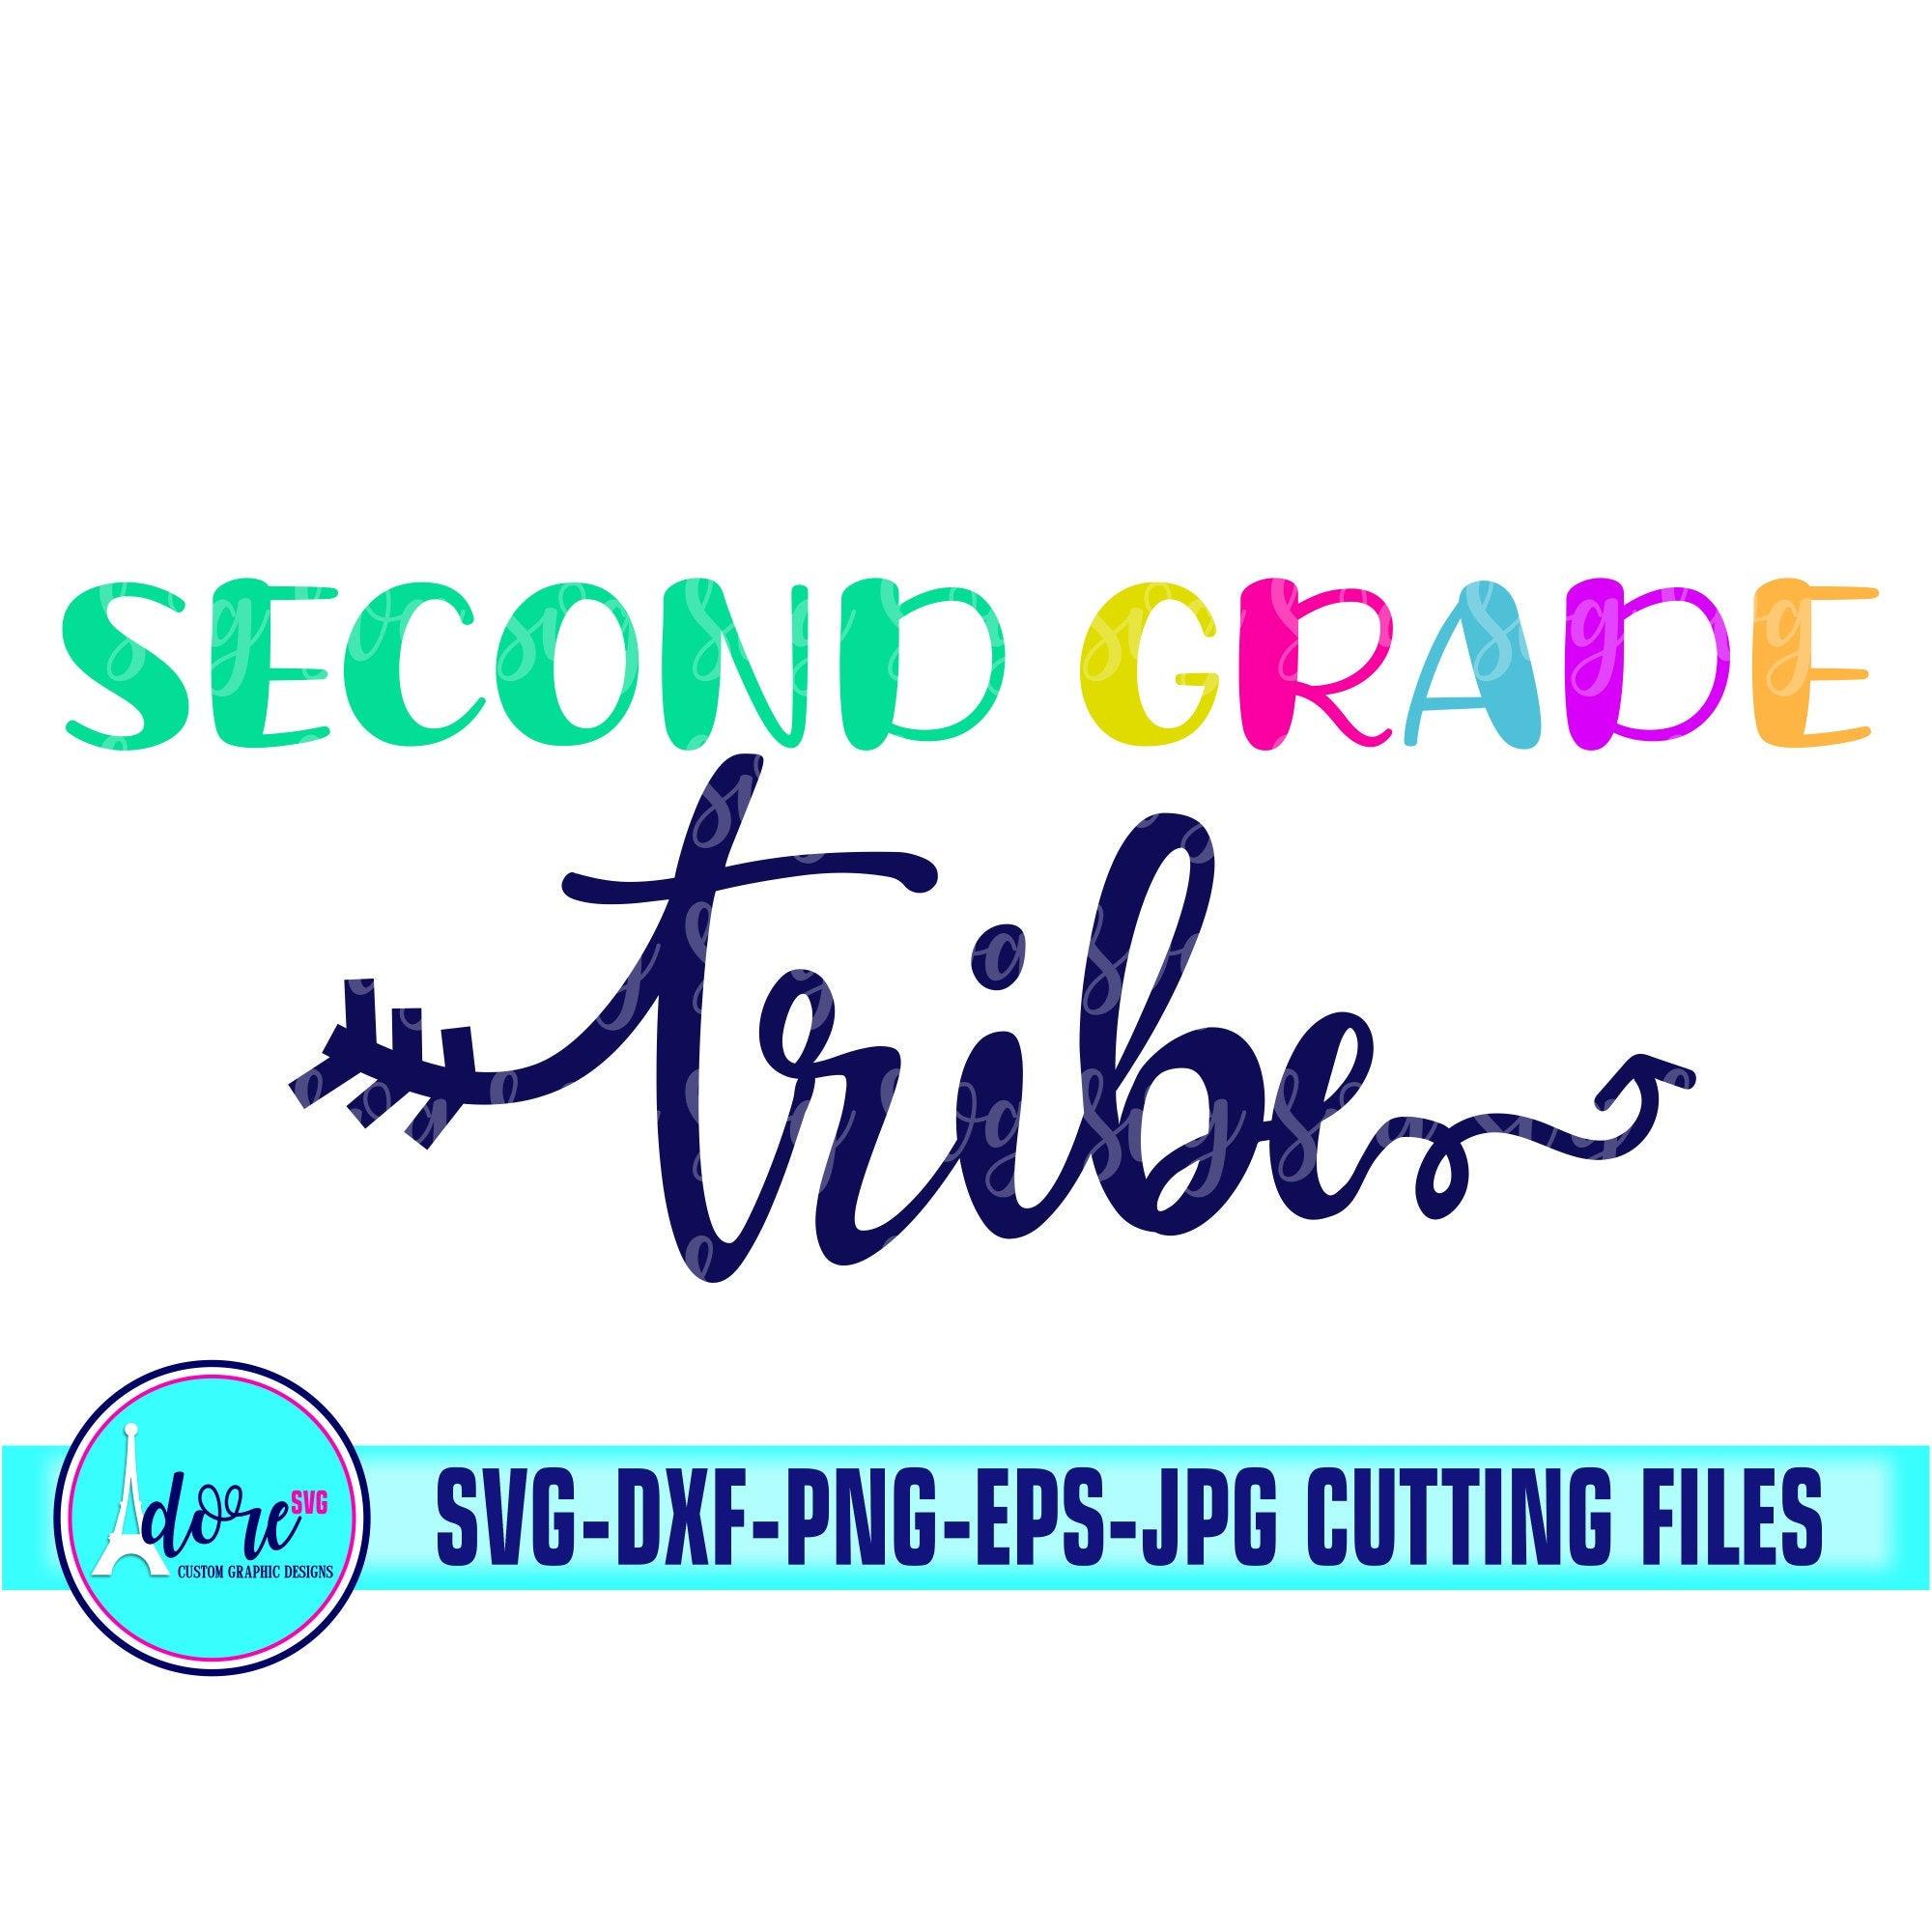 2nd Grade Tribe Svg First Day Of School Svg School Svg My Tribe Svg Teacher Svg For Cricut Beginning Of Year 2nd Grade Svg Back To School Svg For Cricut